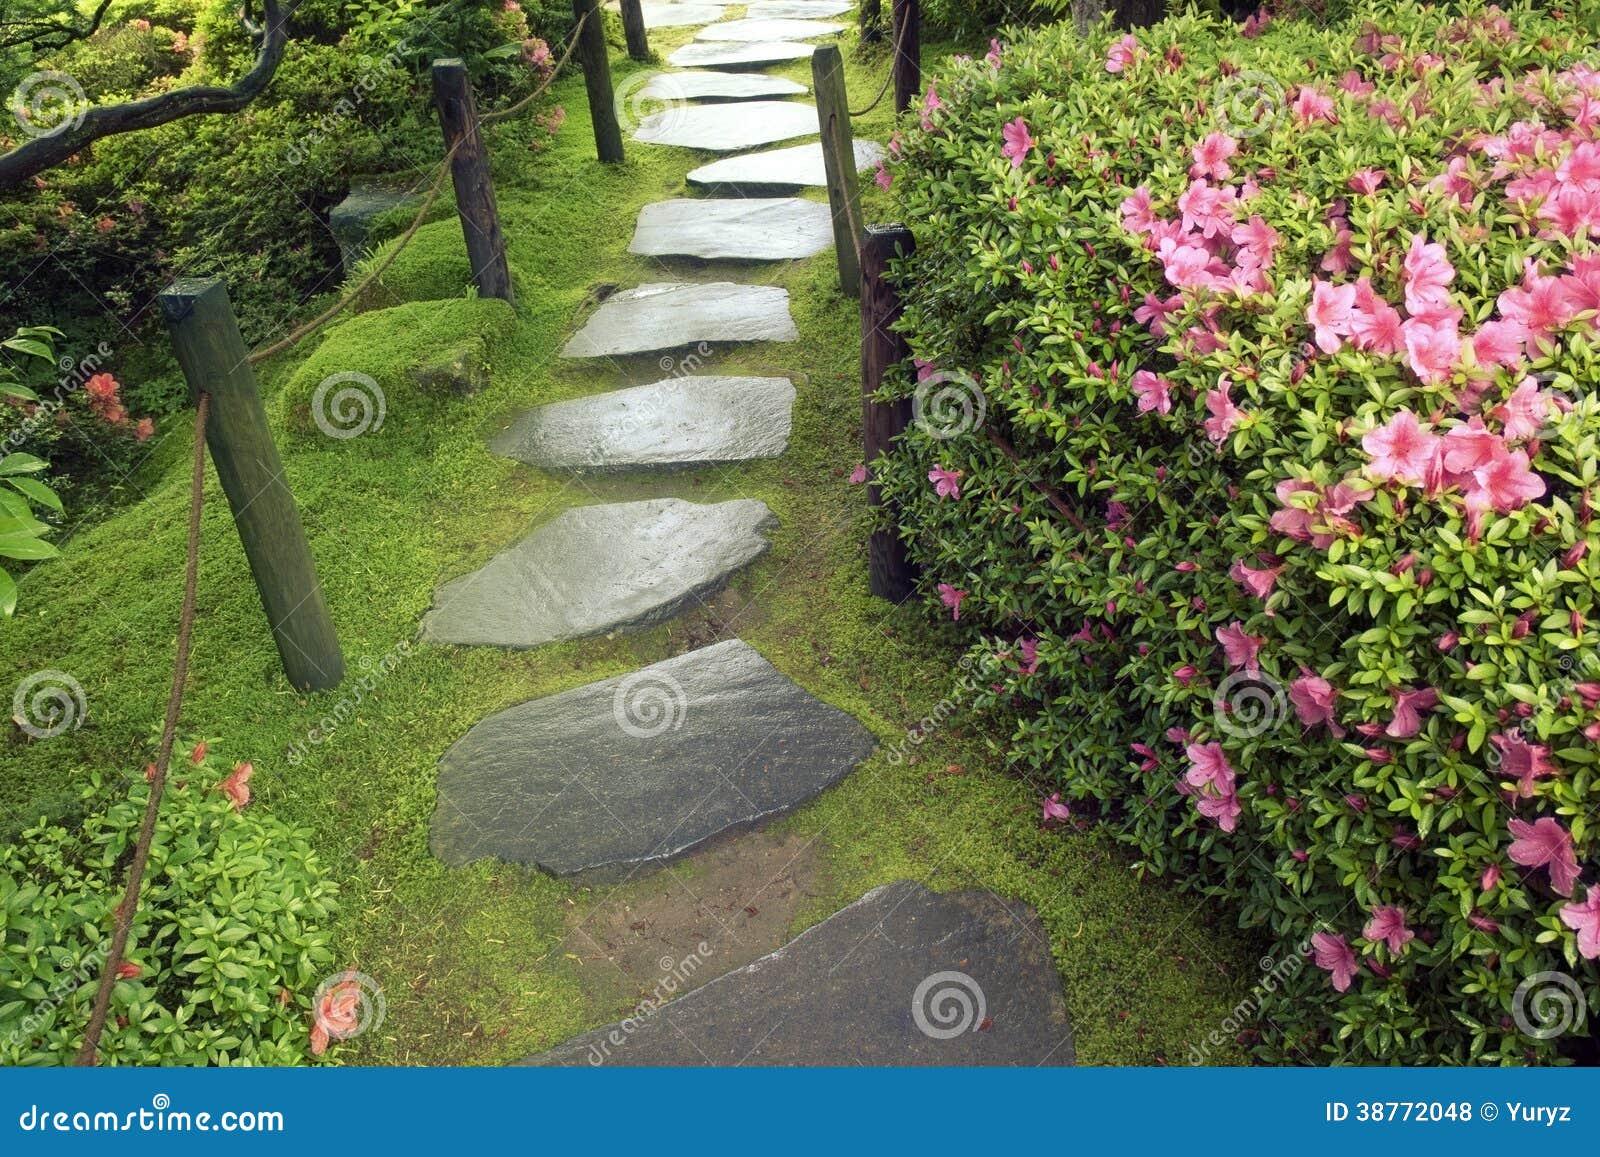 zen garden summer - photo #25